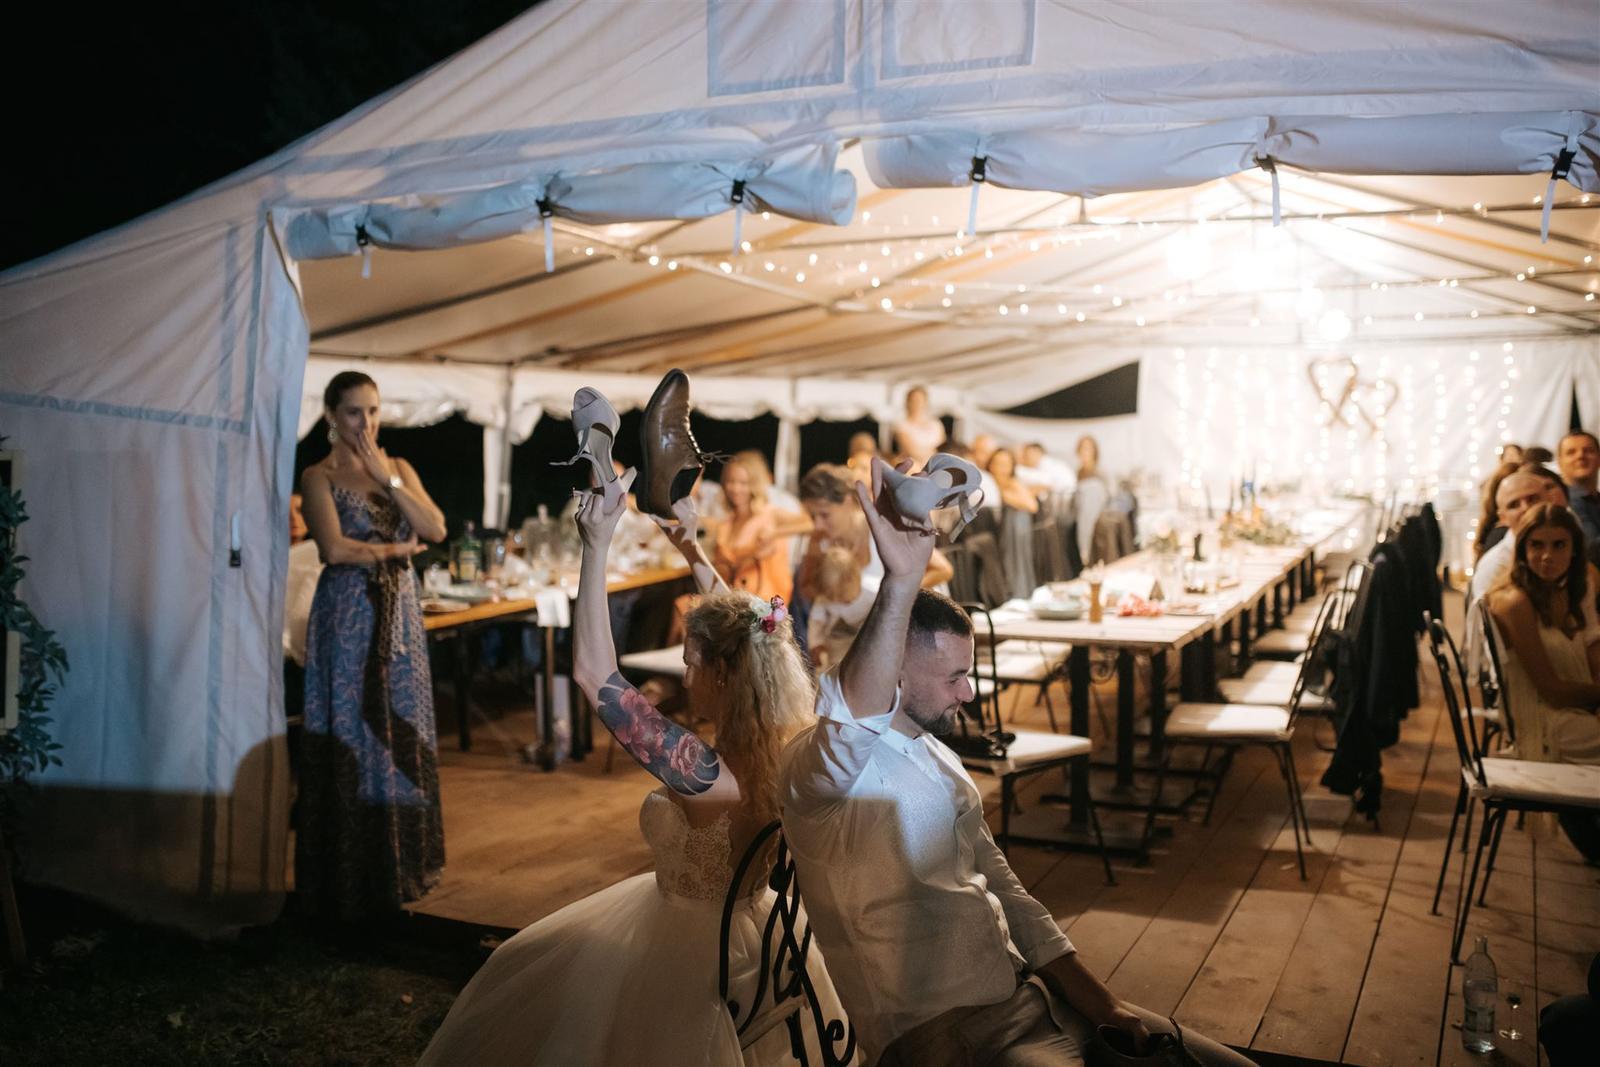 Krásna a romantická svadobná party v záhrade reštaurácie Bistra Dukát - Le Gout v srdci B. Bystrice. - Obrázok č. 20